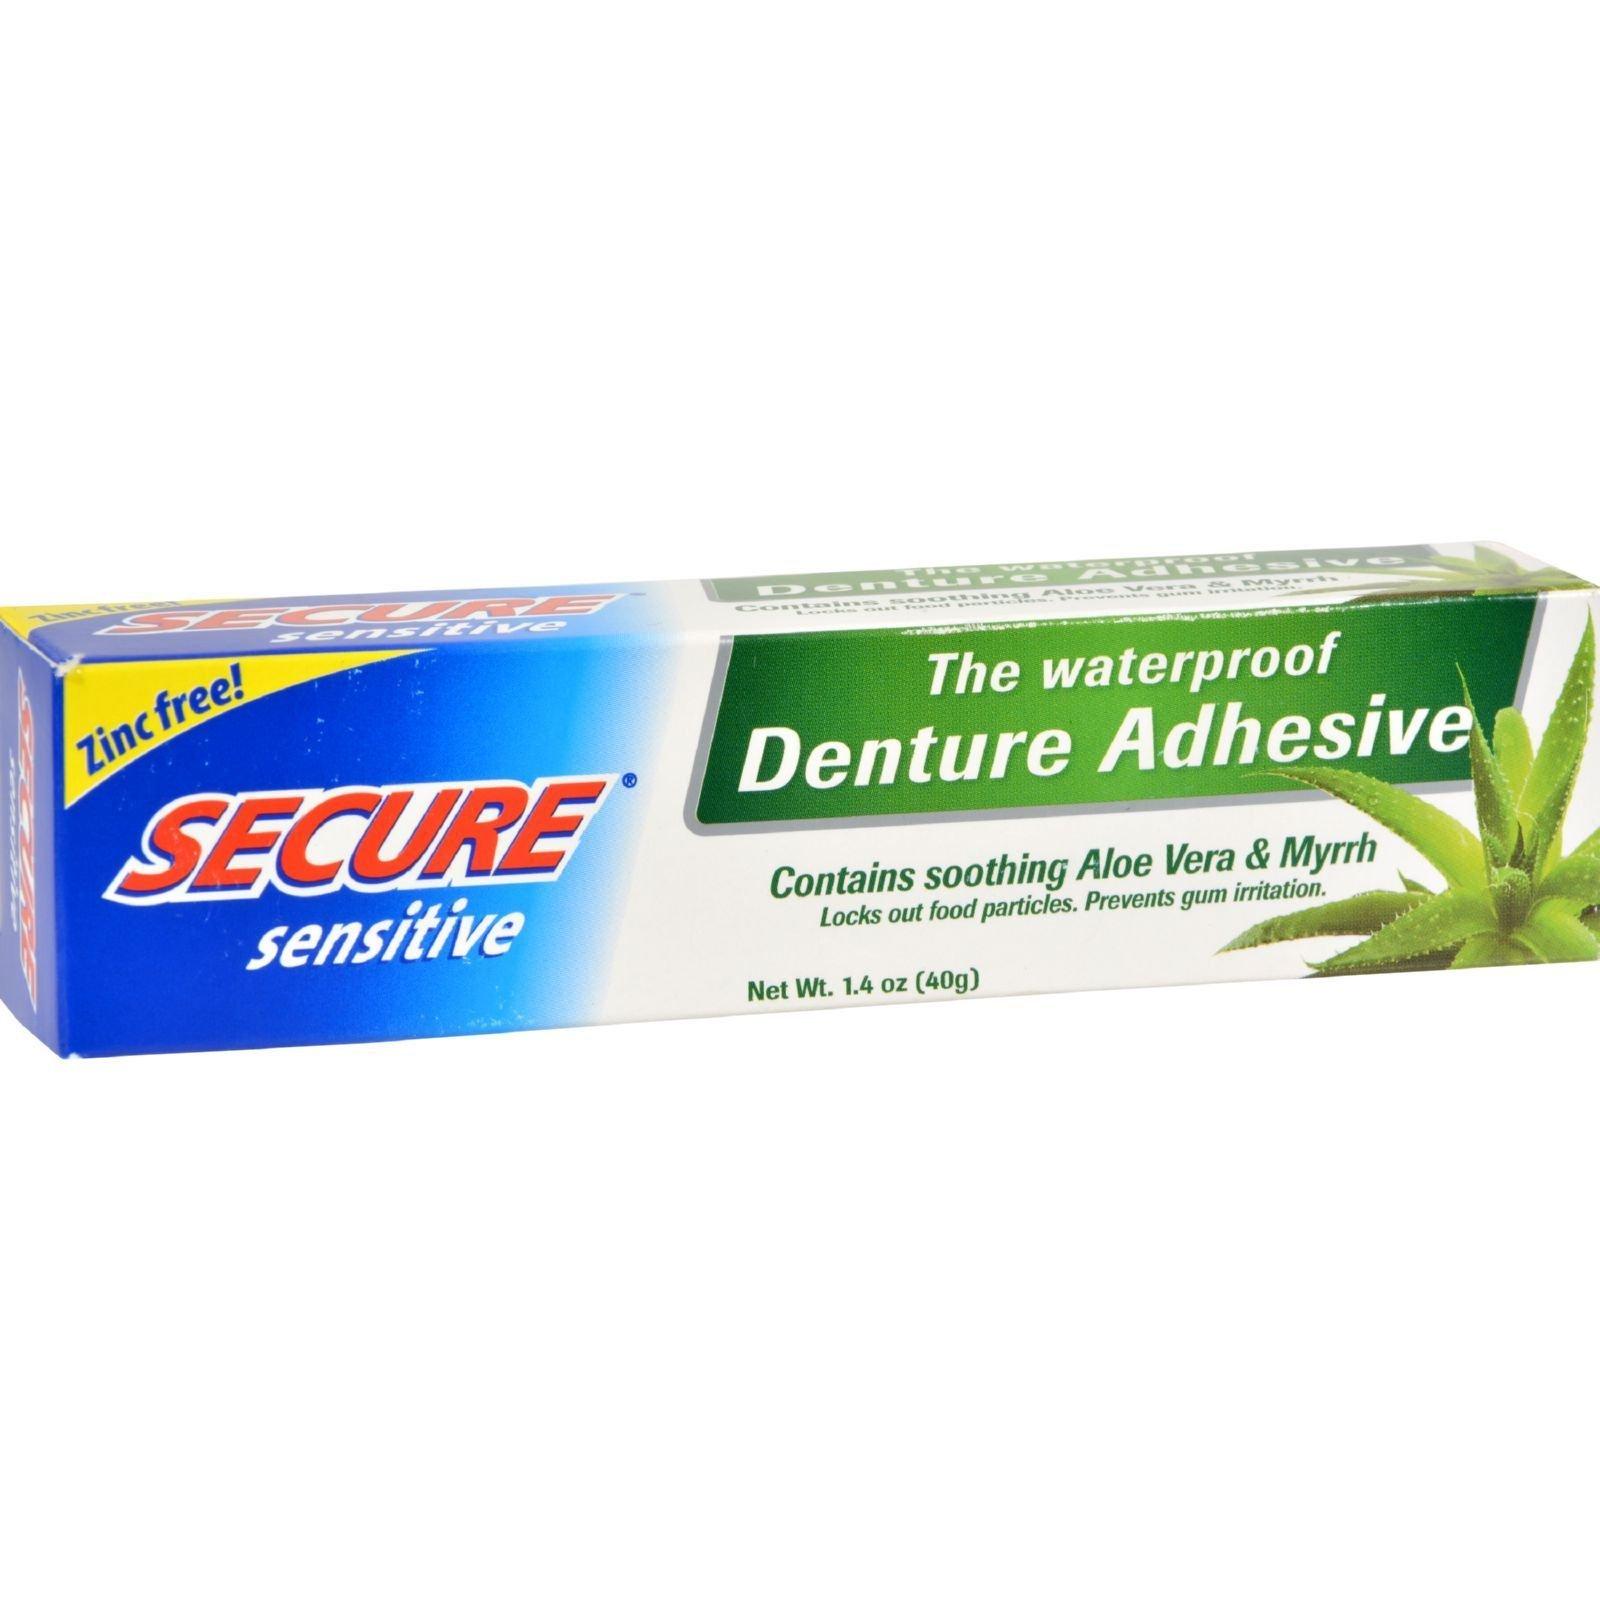 Secure Sensitive Denture Adhesive, 1.4 oz (Pack of 6) by SECURE Denture Adhesive